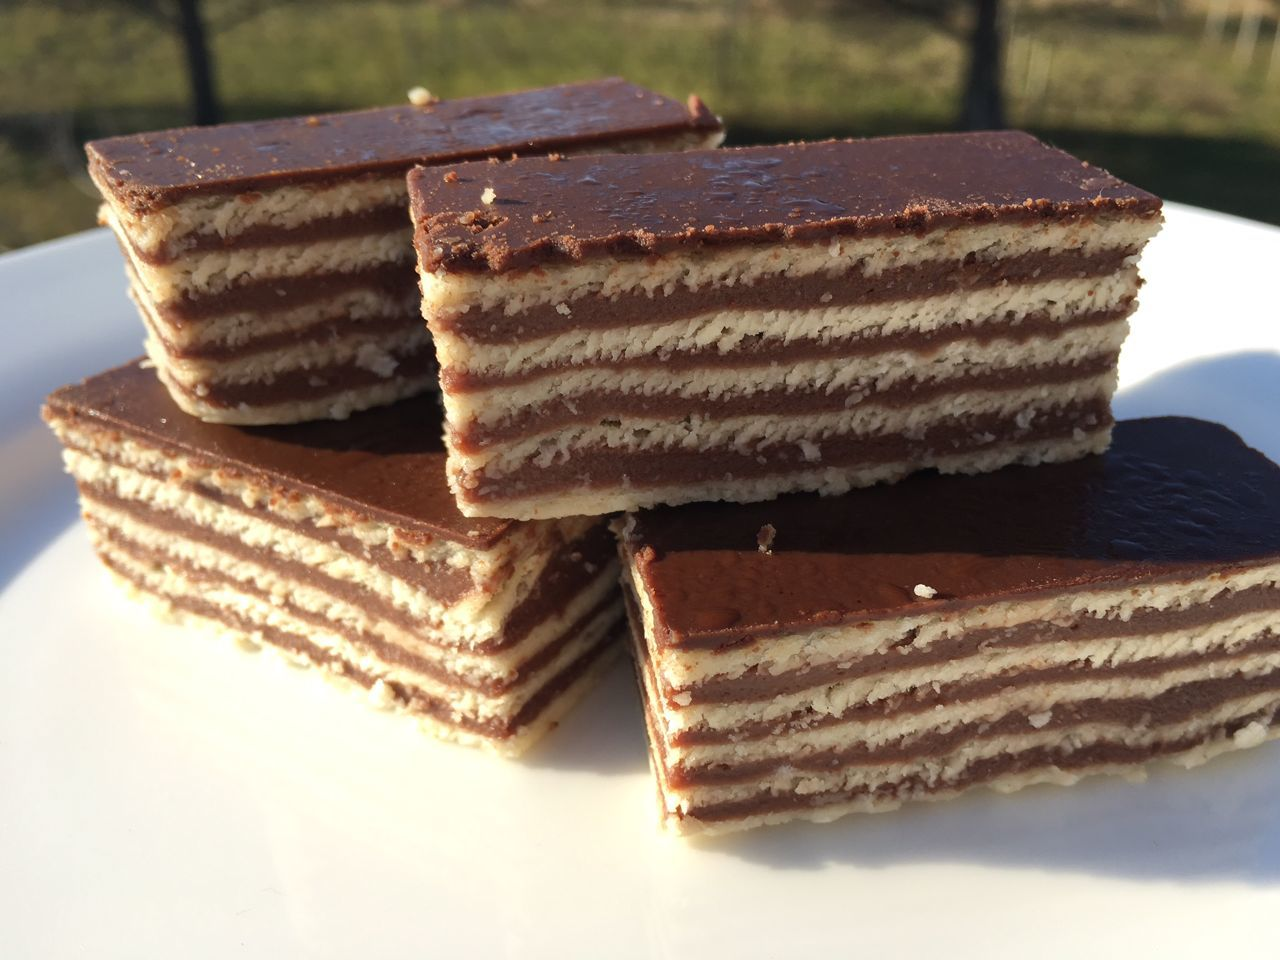 Croatian Mađarica Cake (Layered Chocolate Slice)